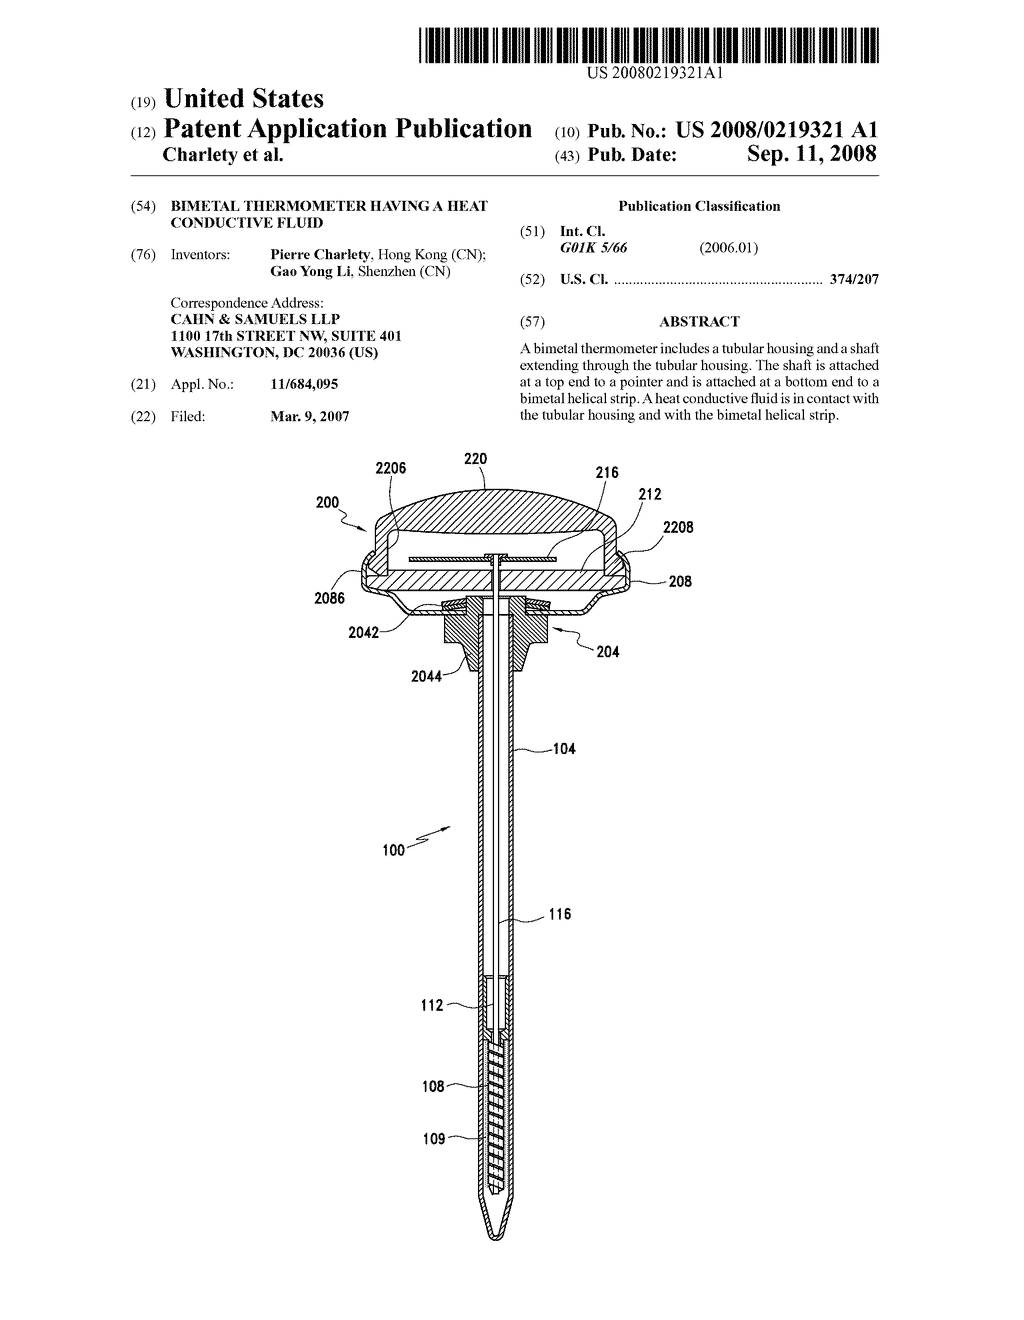 20080219321_01 bimetal thermometer having a heat conductive fluid diagram